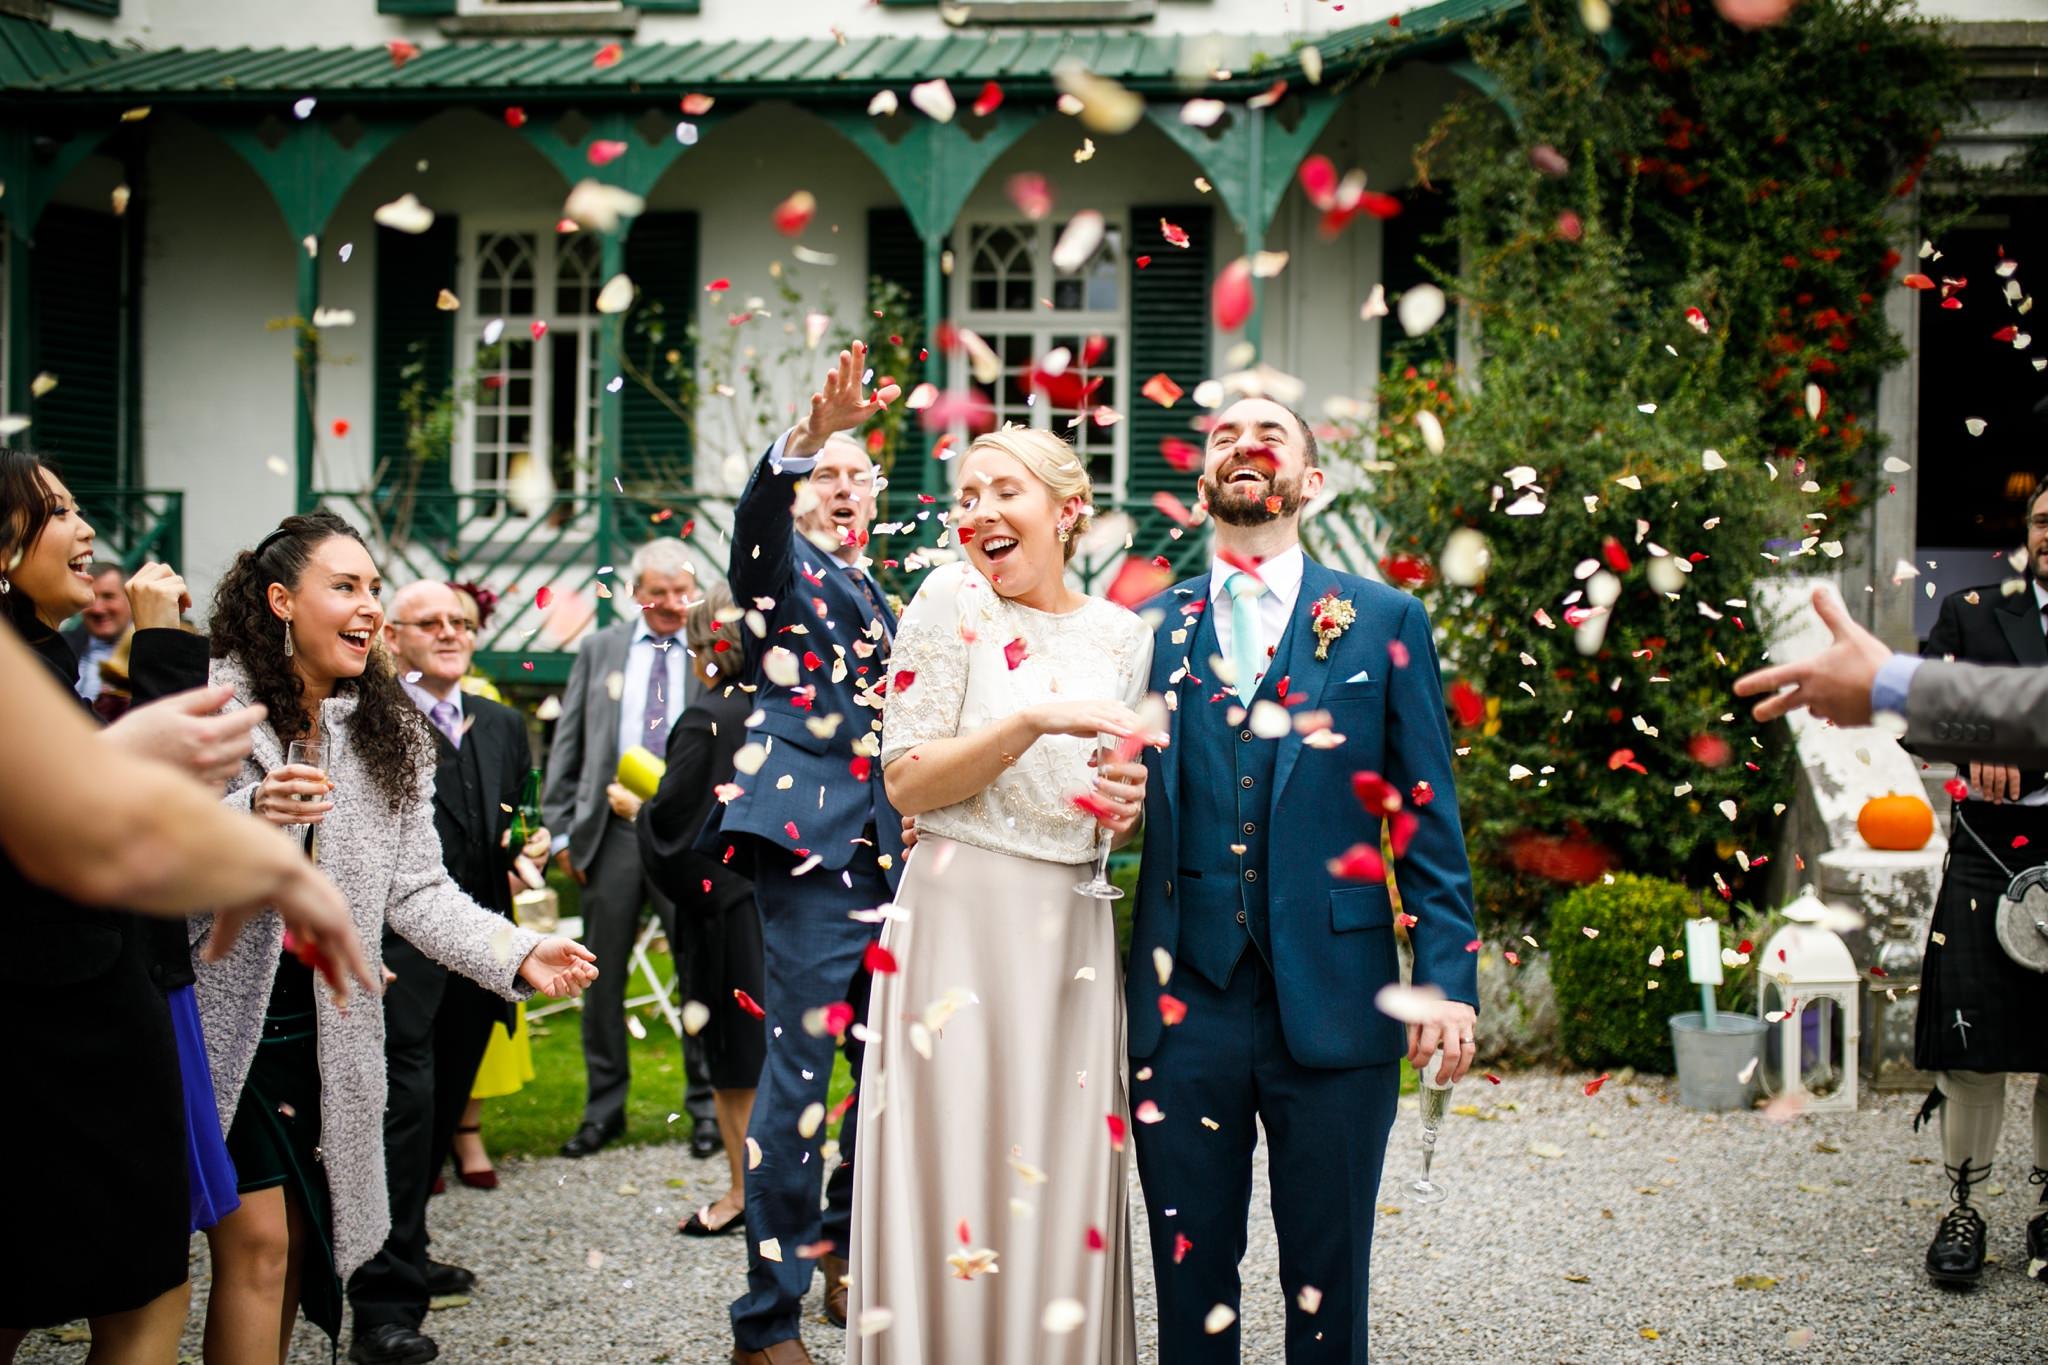 Elisha-Clarke-Photography-Dublin-City-Wedding_0079.jpg